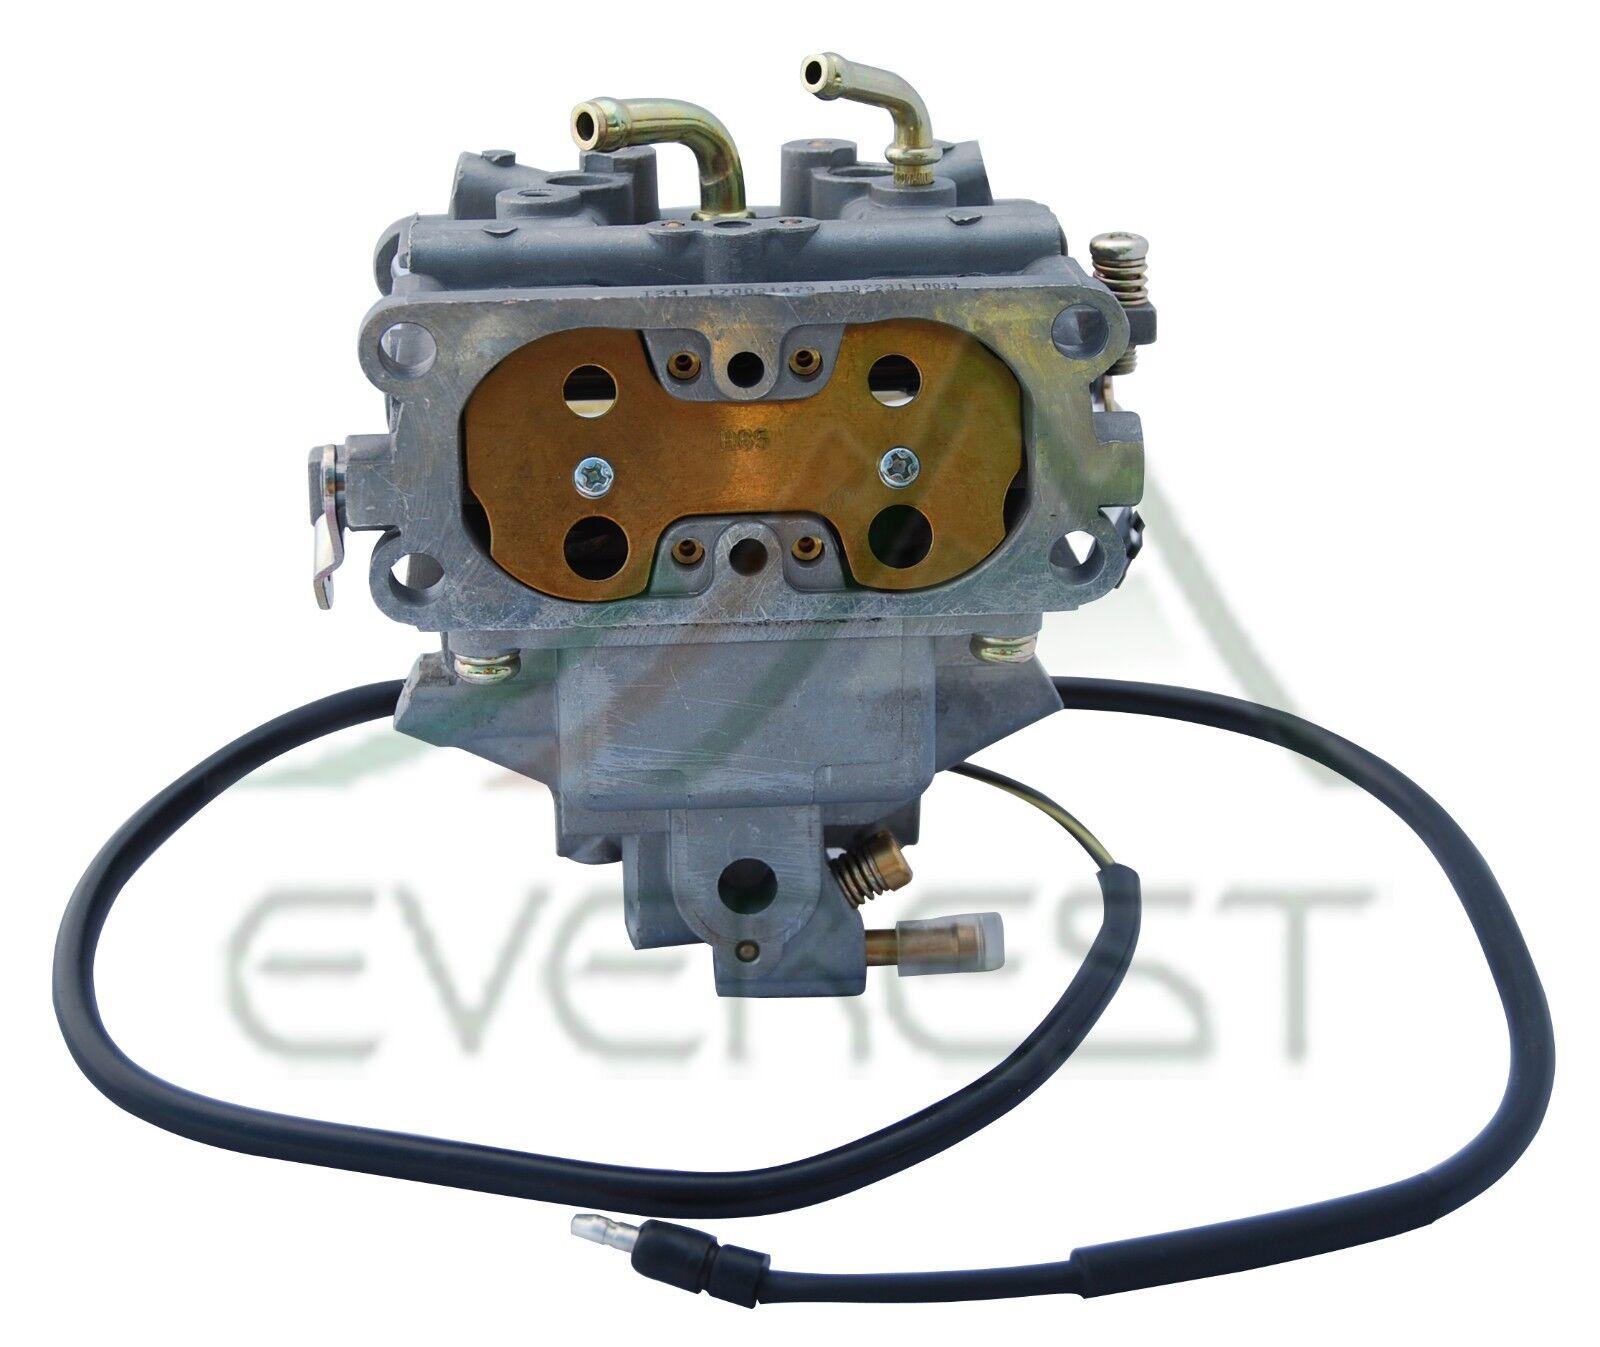 Honda Gx670 24 Hp V Twin Engine Honda Engine Problems And Solutions – Honda Gx670 24 Hp Wiring Diagram